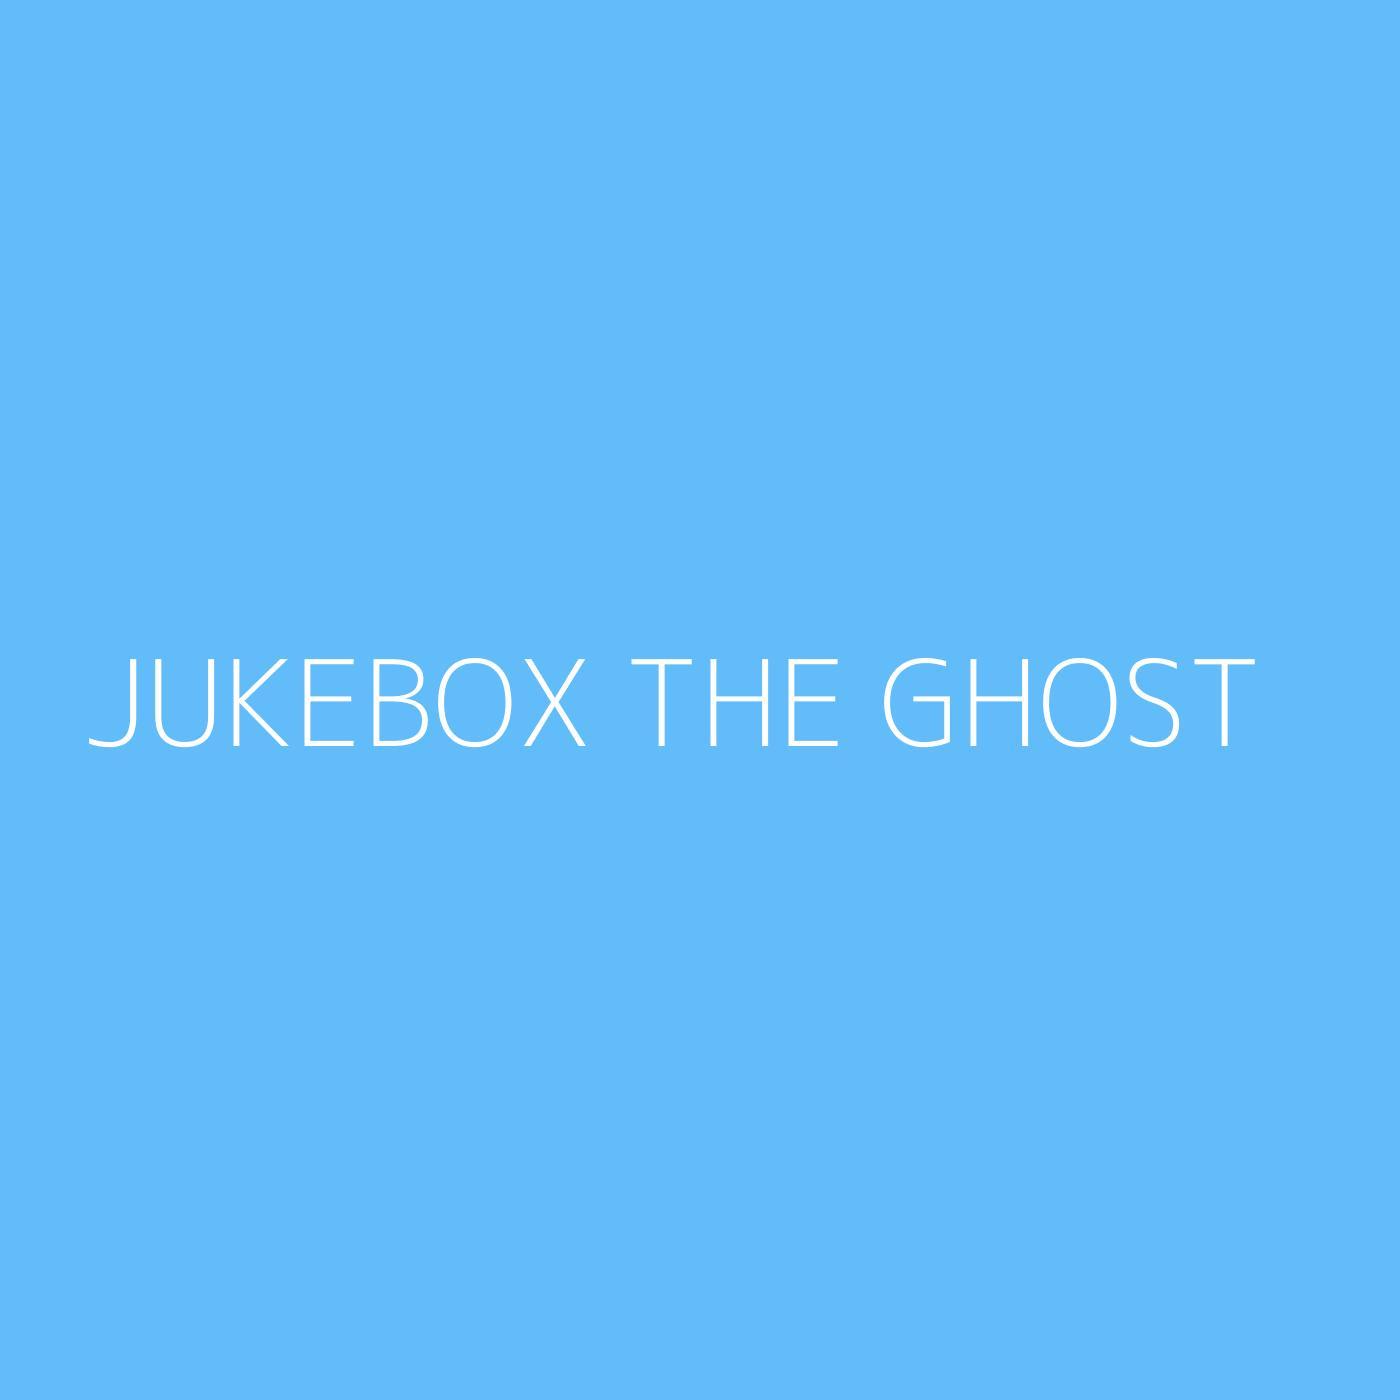 Jukebox The Ghost Playlist Artwork